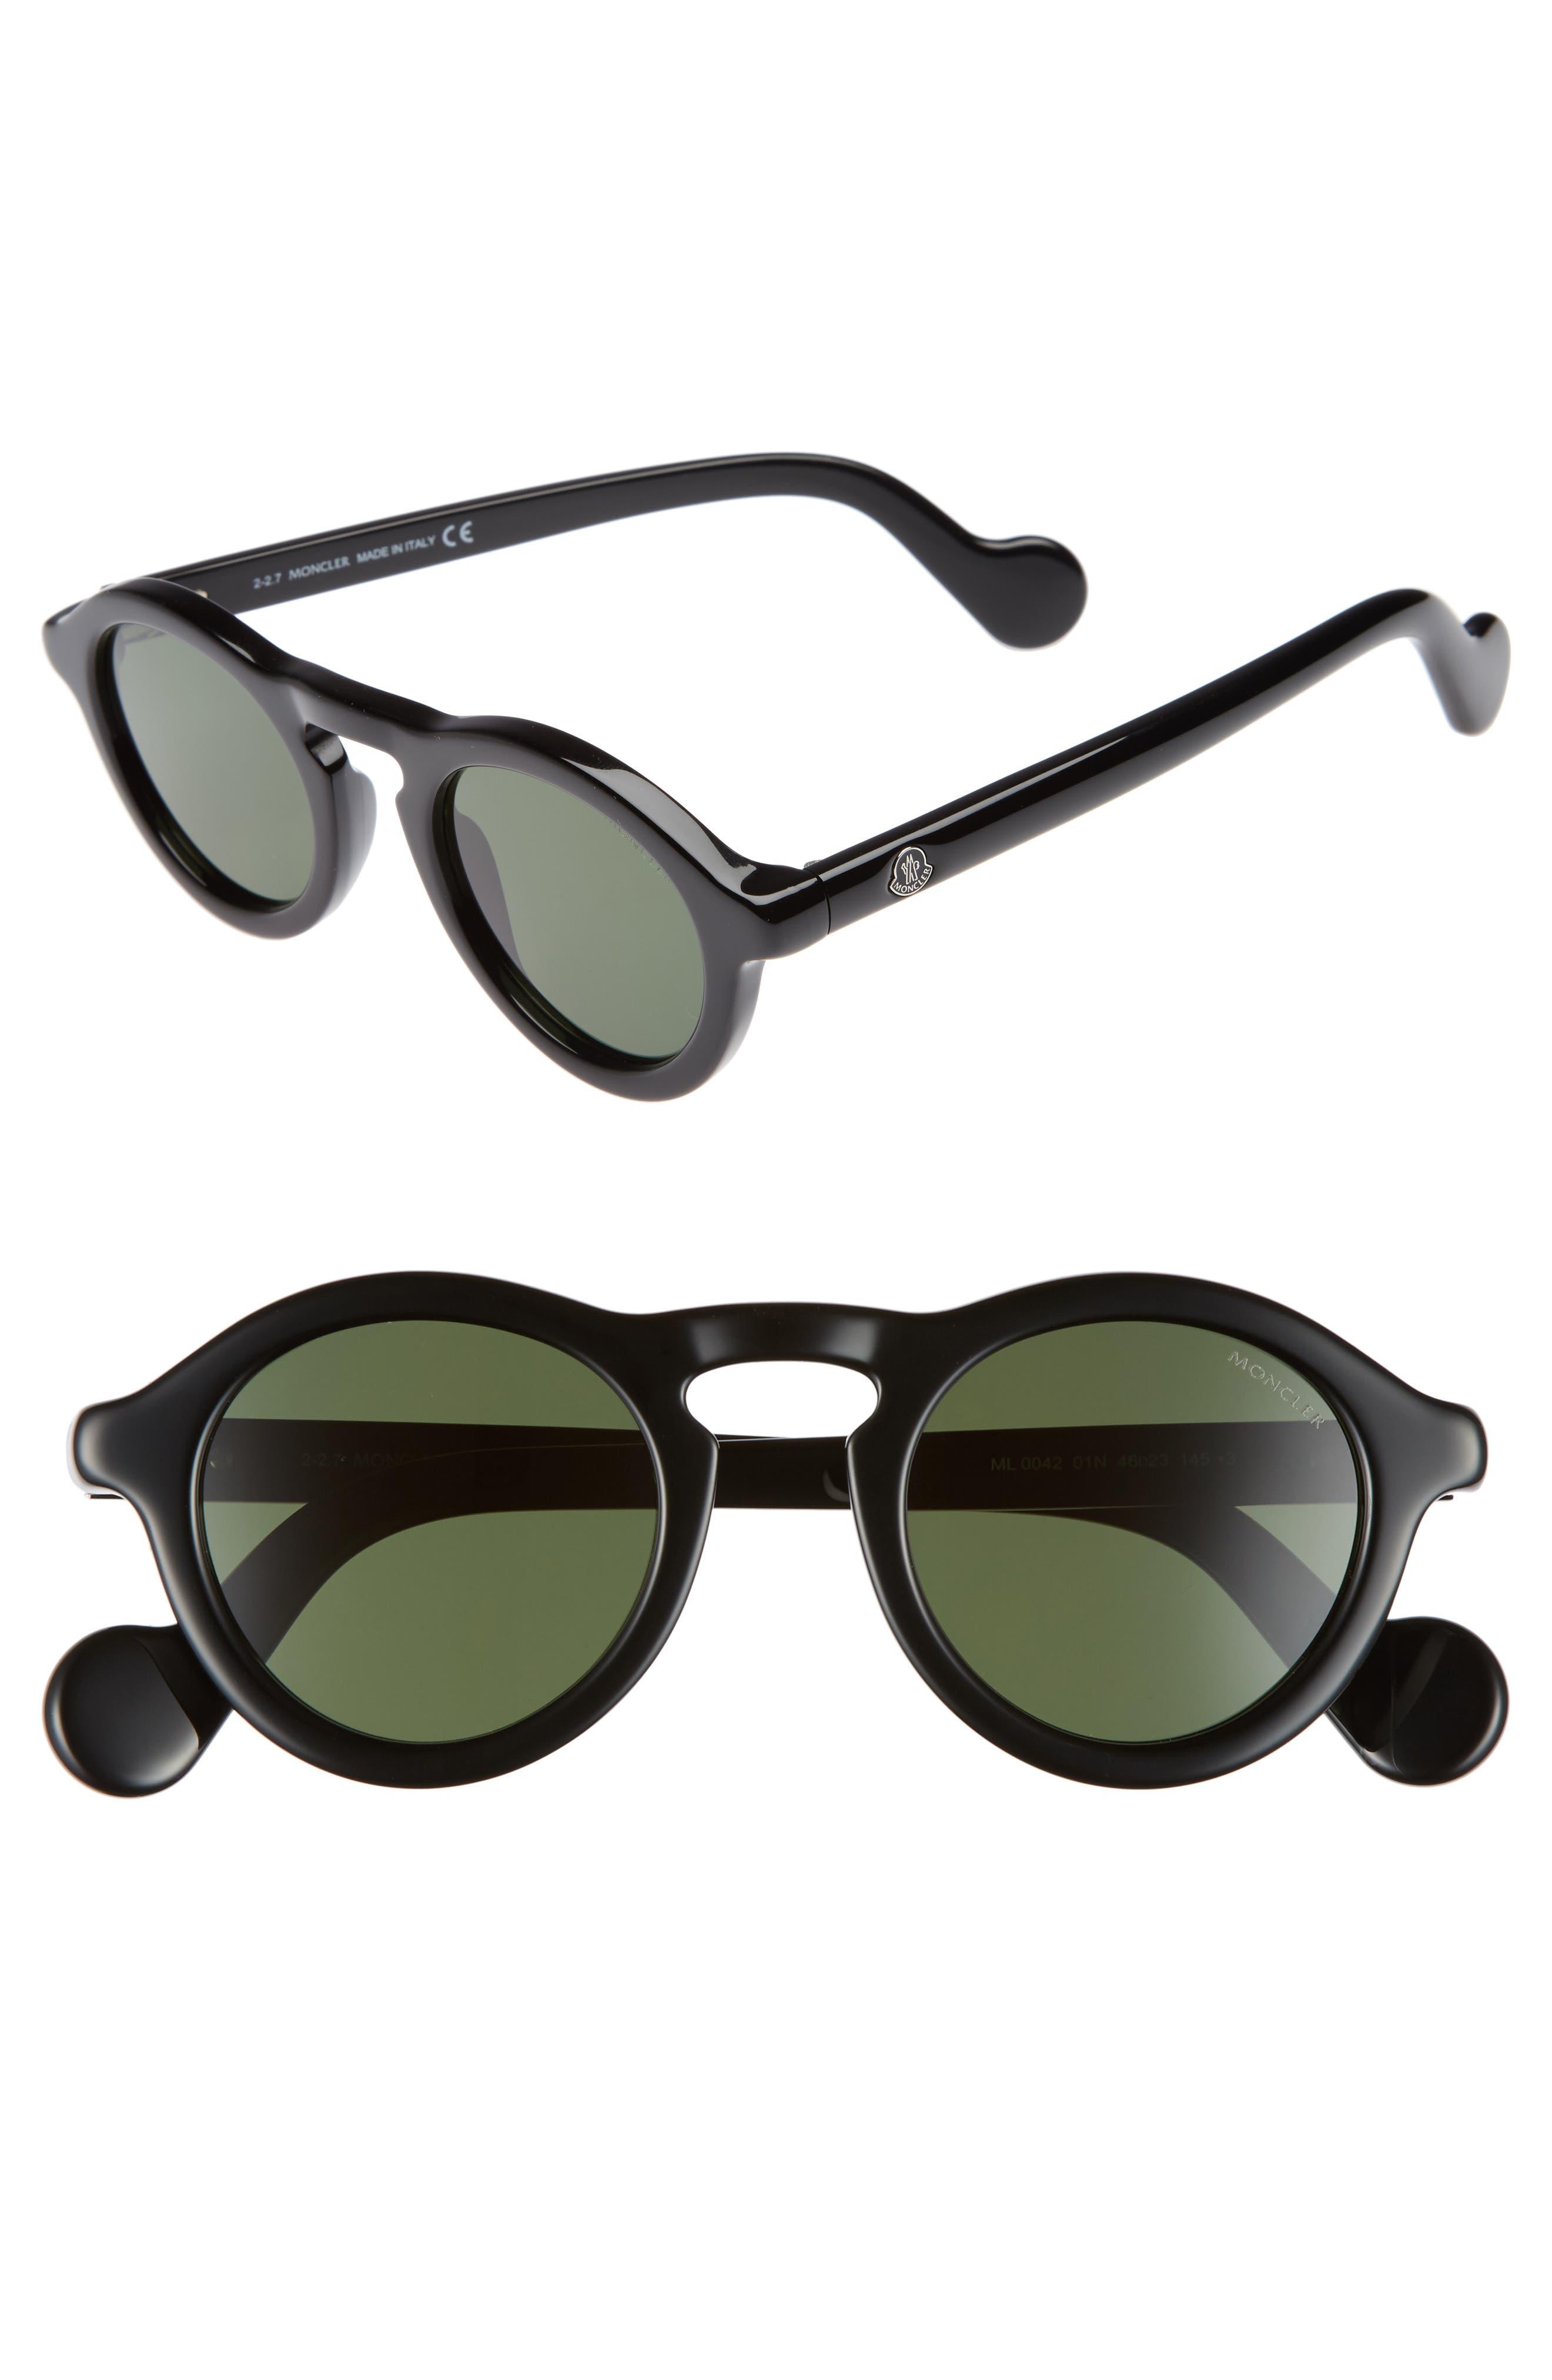 46mm Round Sunglasses,                             Main thumbnail 1, color,                             SHINY BLACK/ GREEN